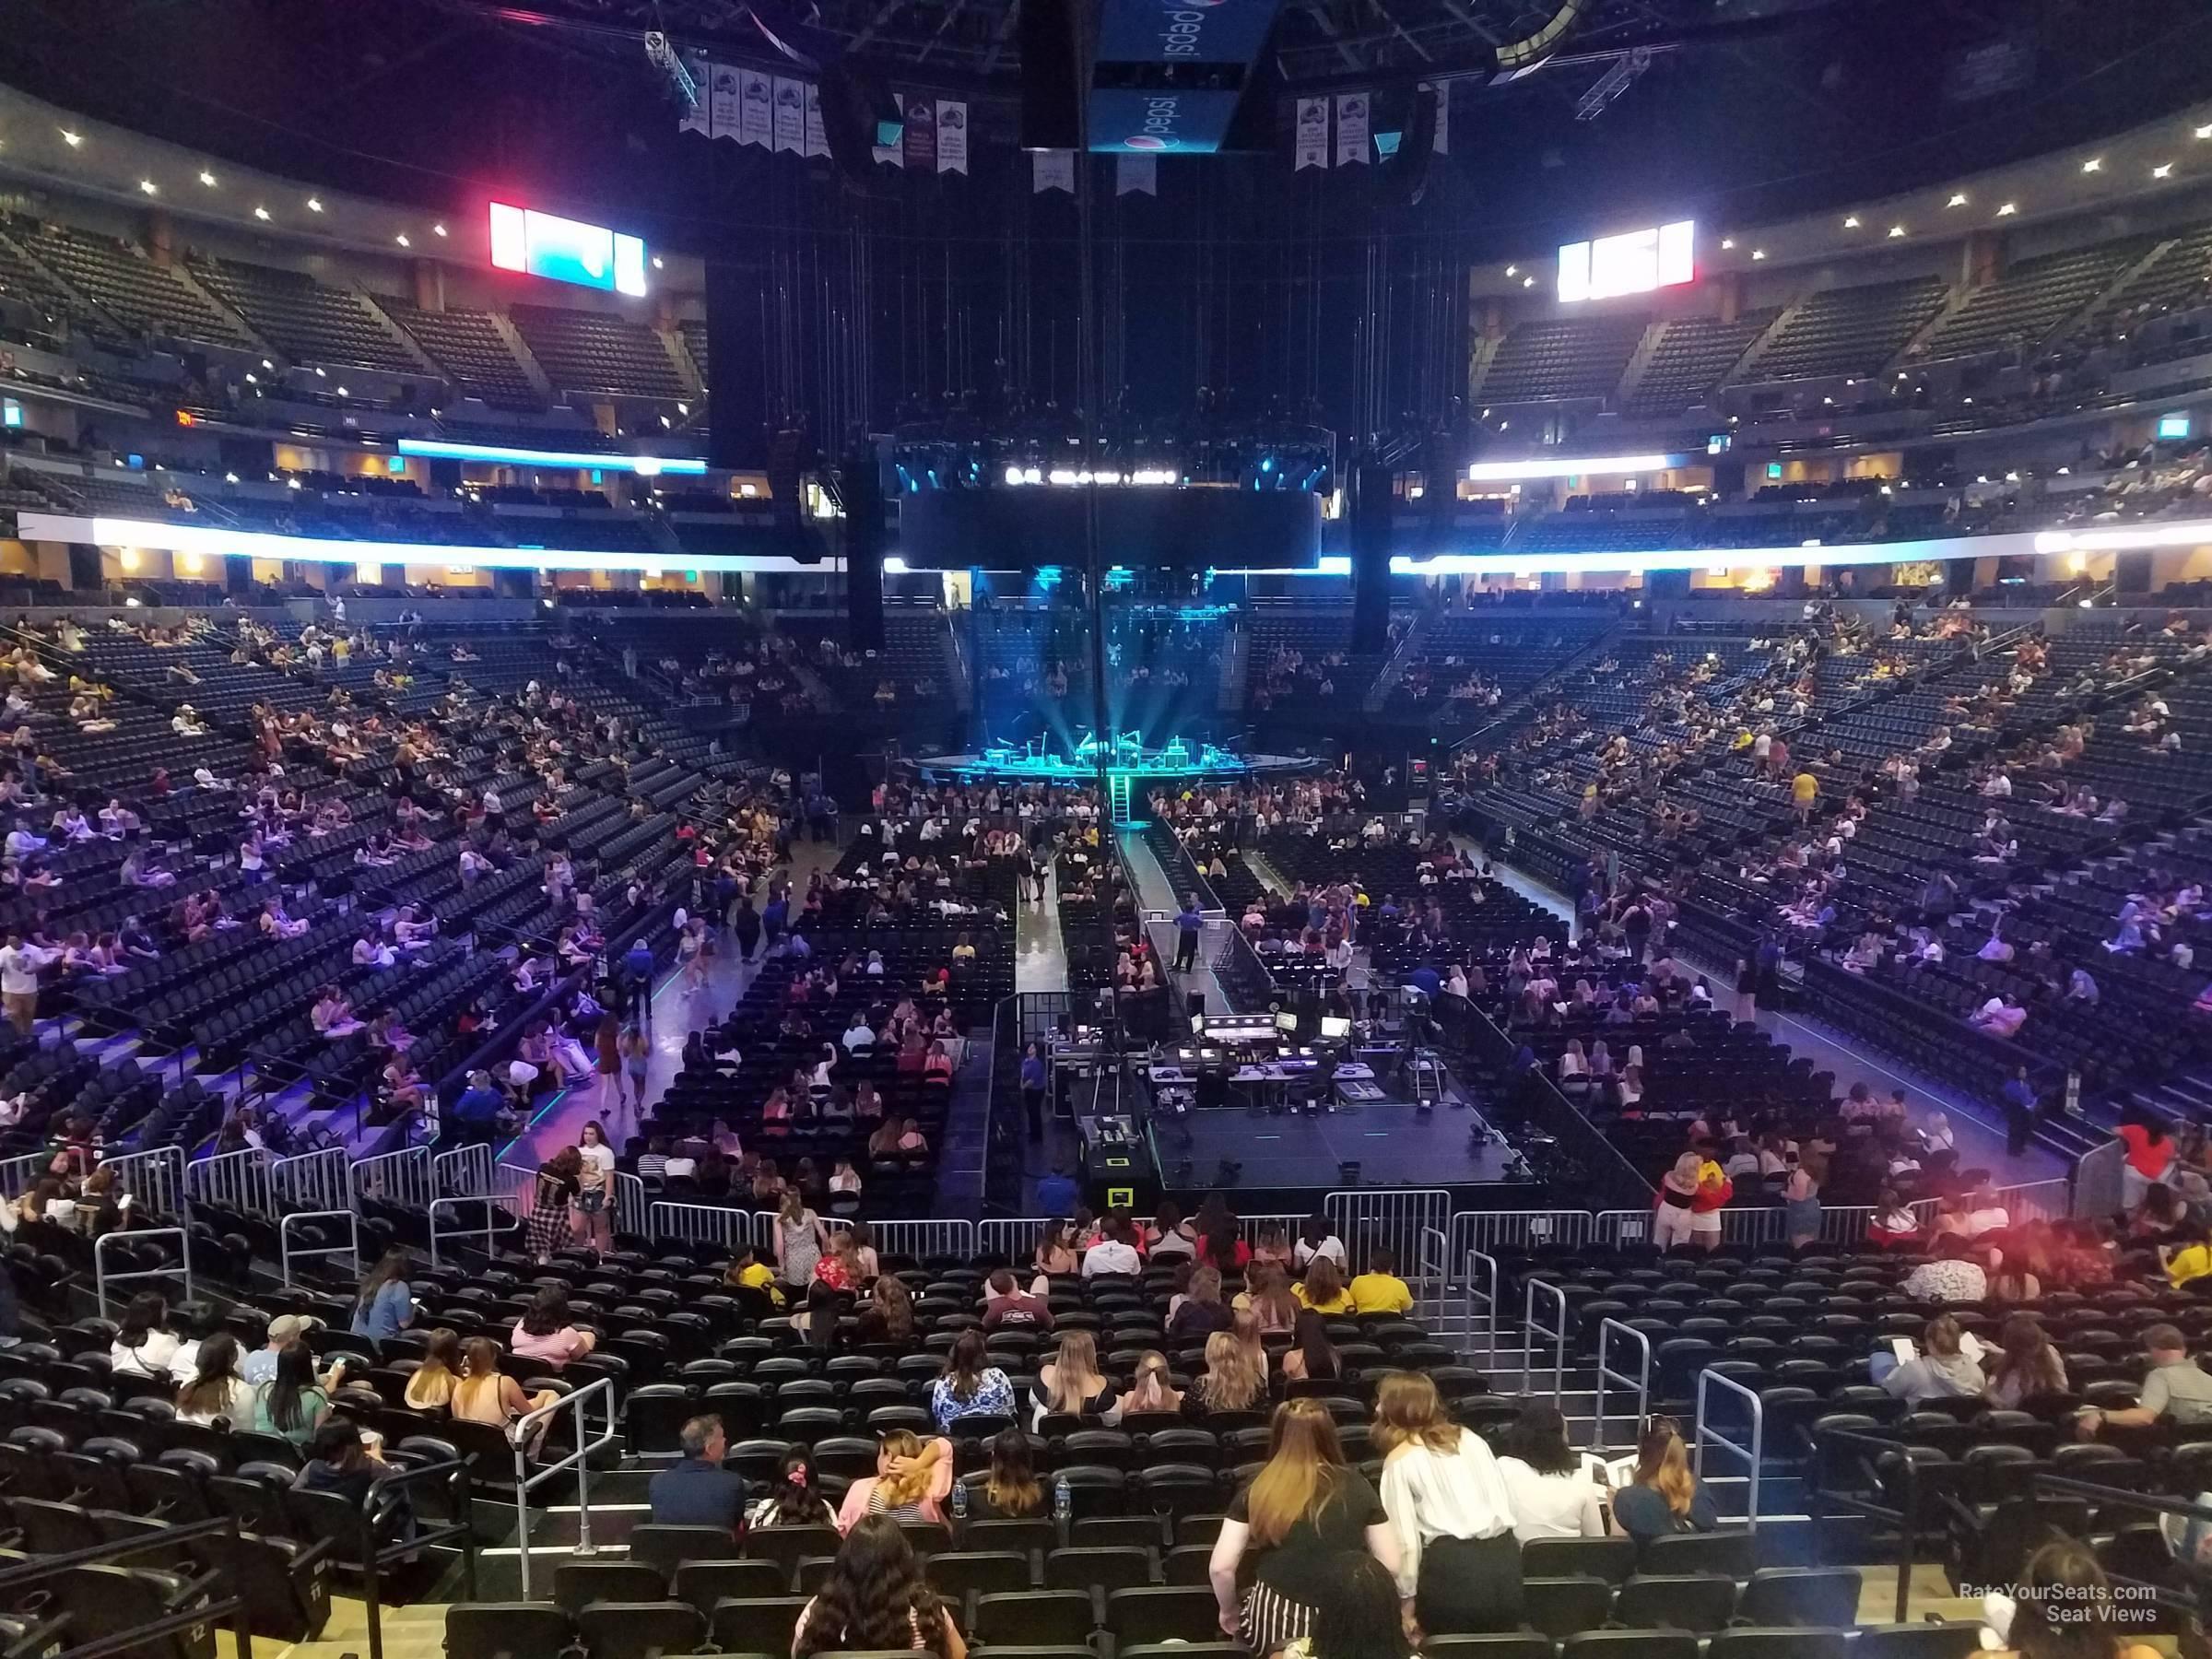 Pepsi Center Section 114 Concert Seating Rateyourseatscom